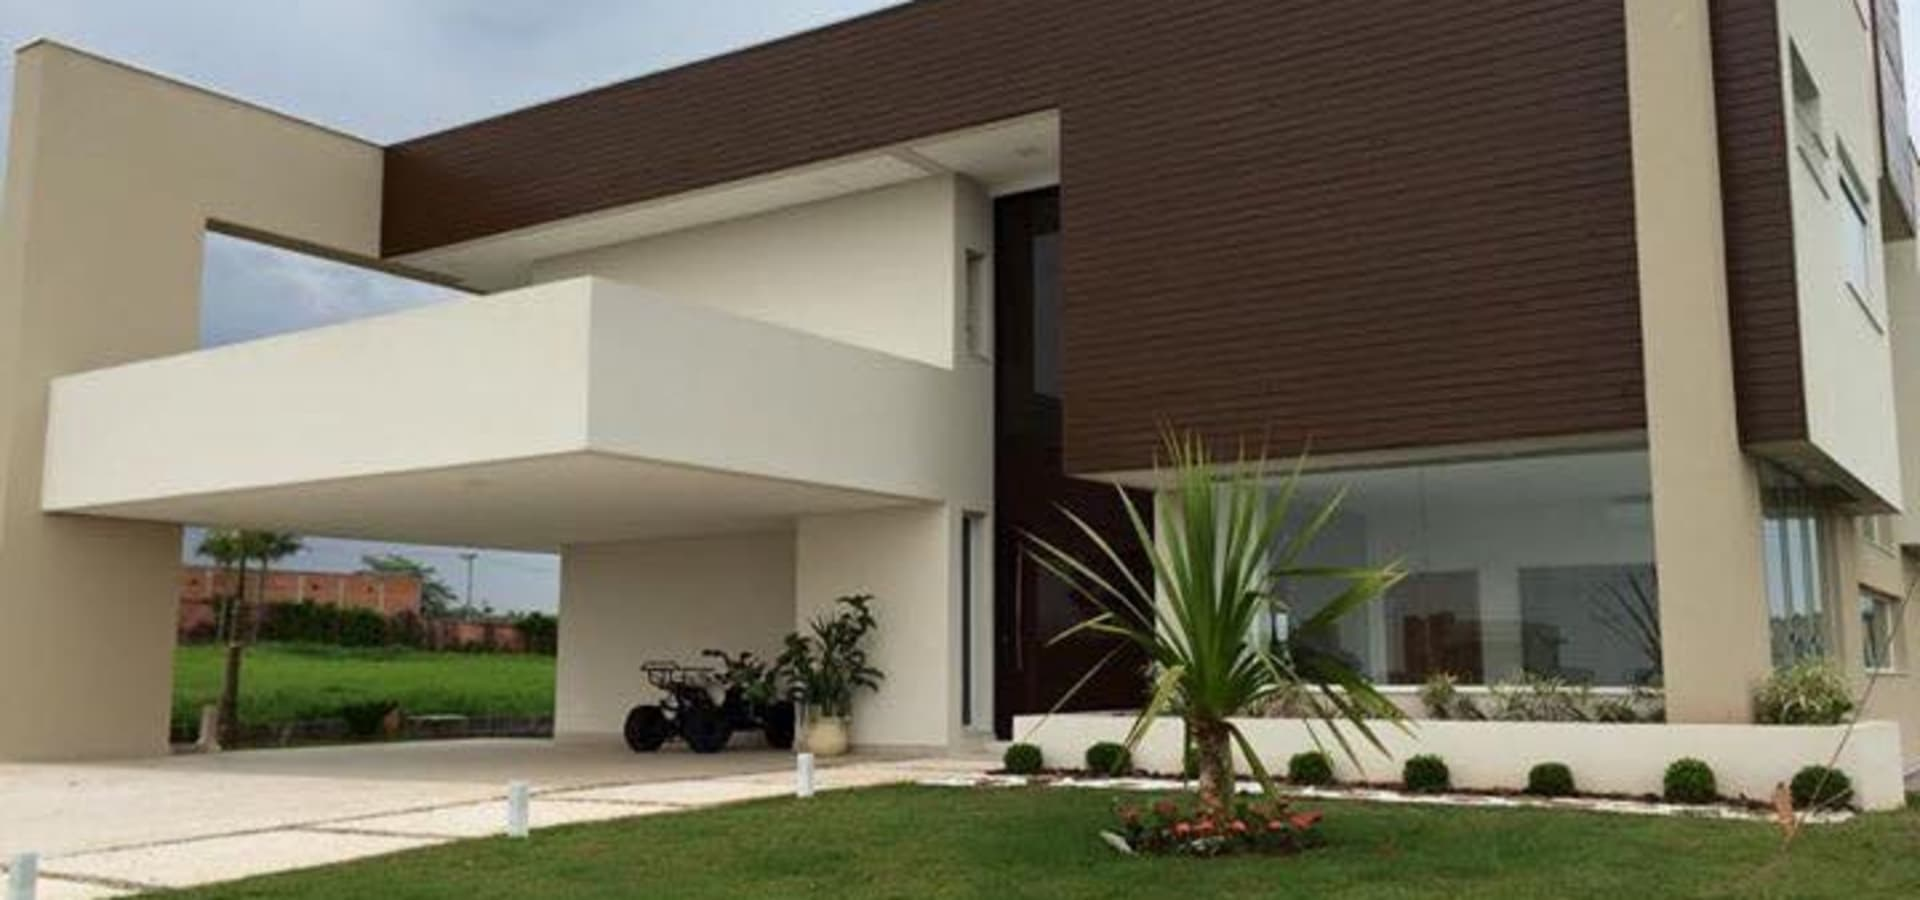 alexandre chaguri arquitetura